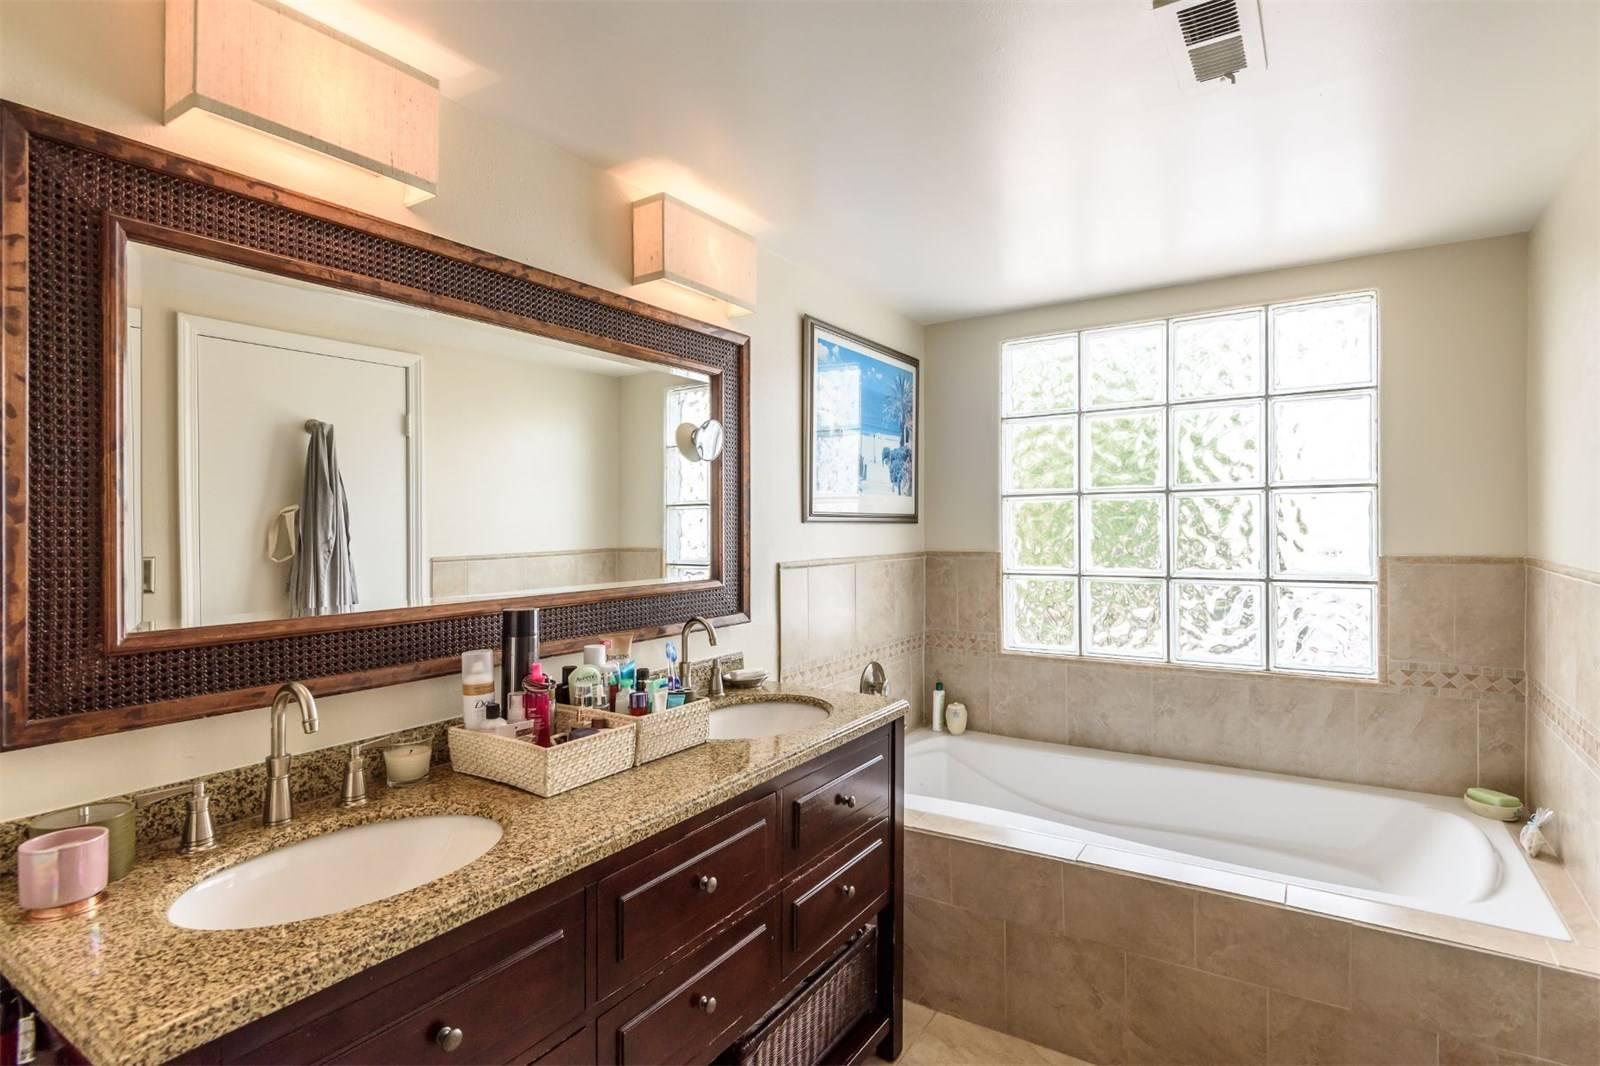 540 1st Street - bathroom glass wall.jpeg